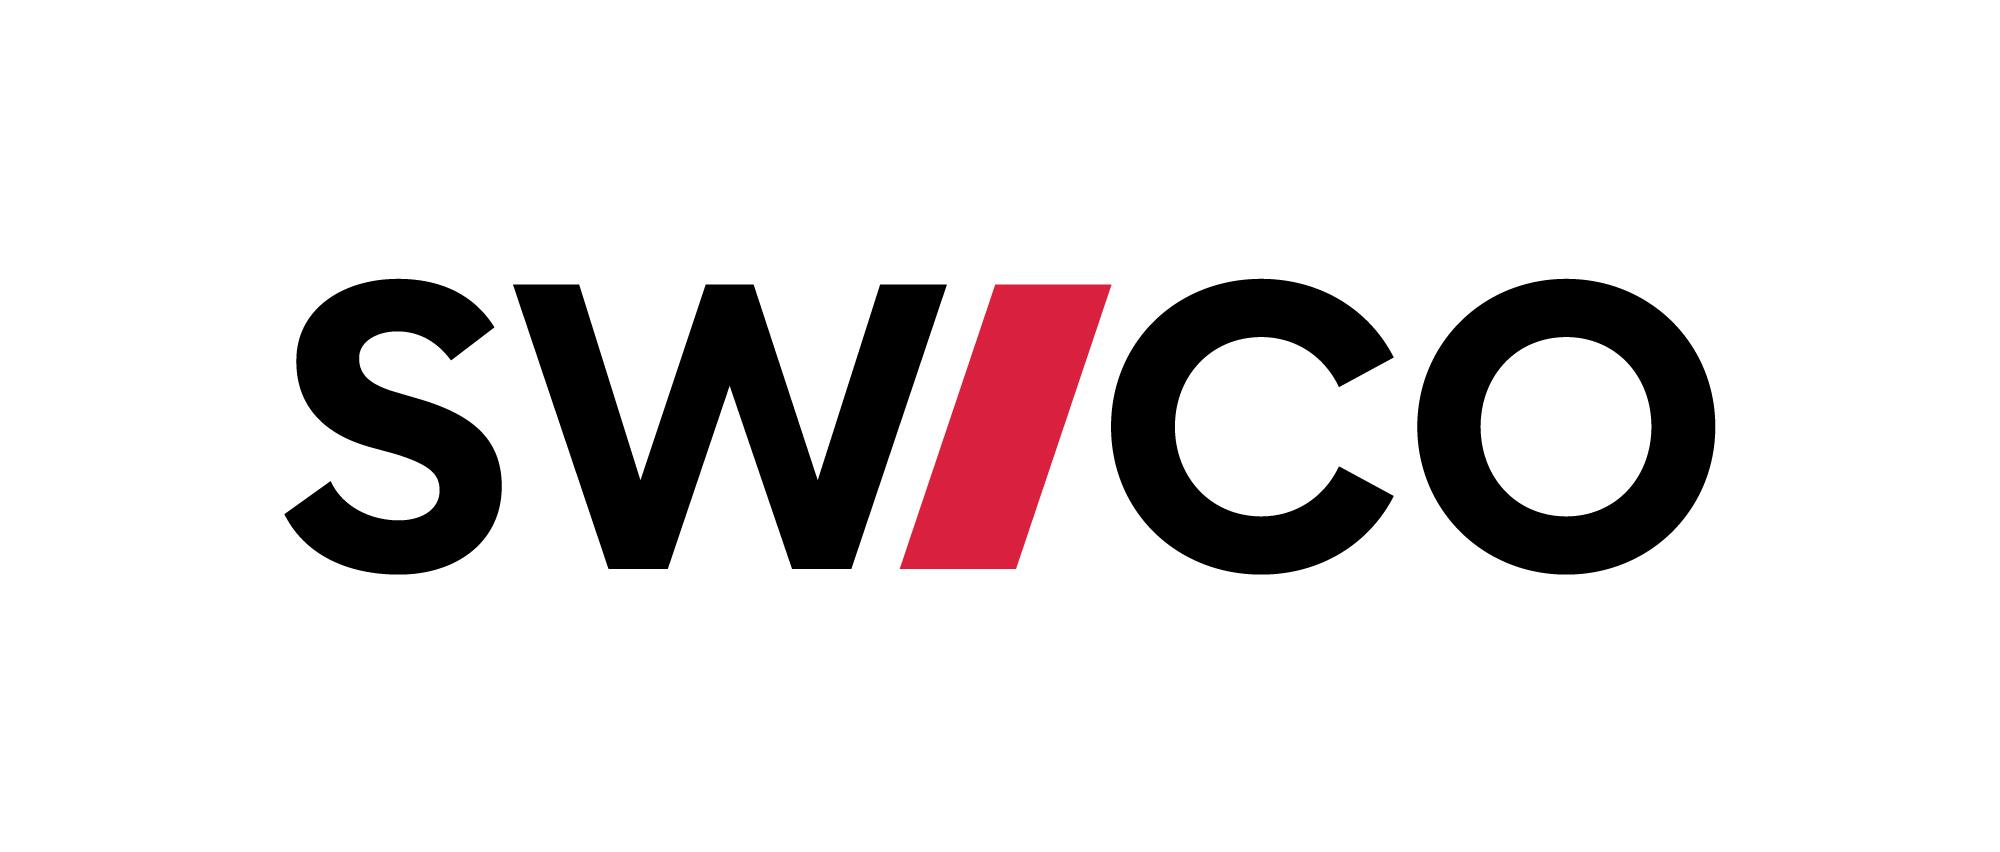 cd_swico_logo_rgb.jpg